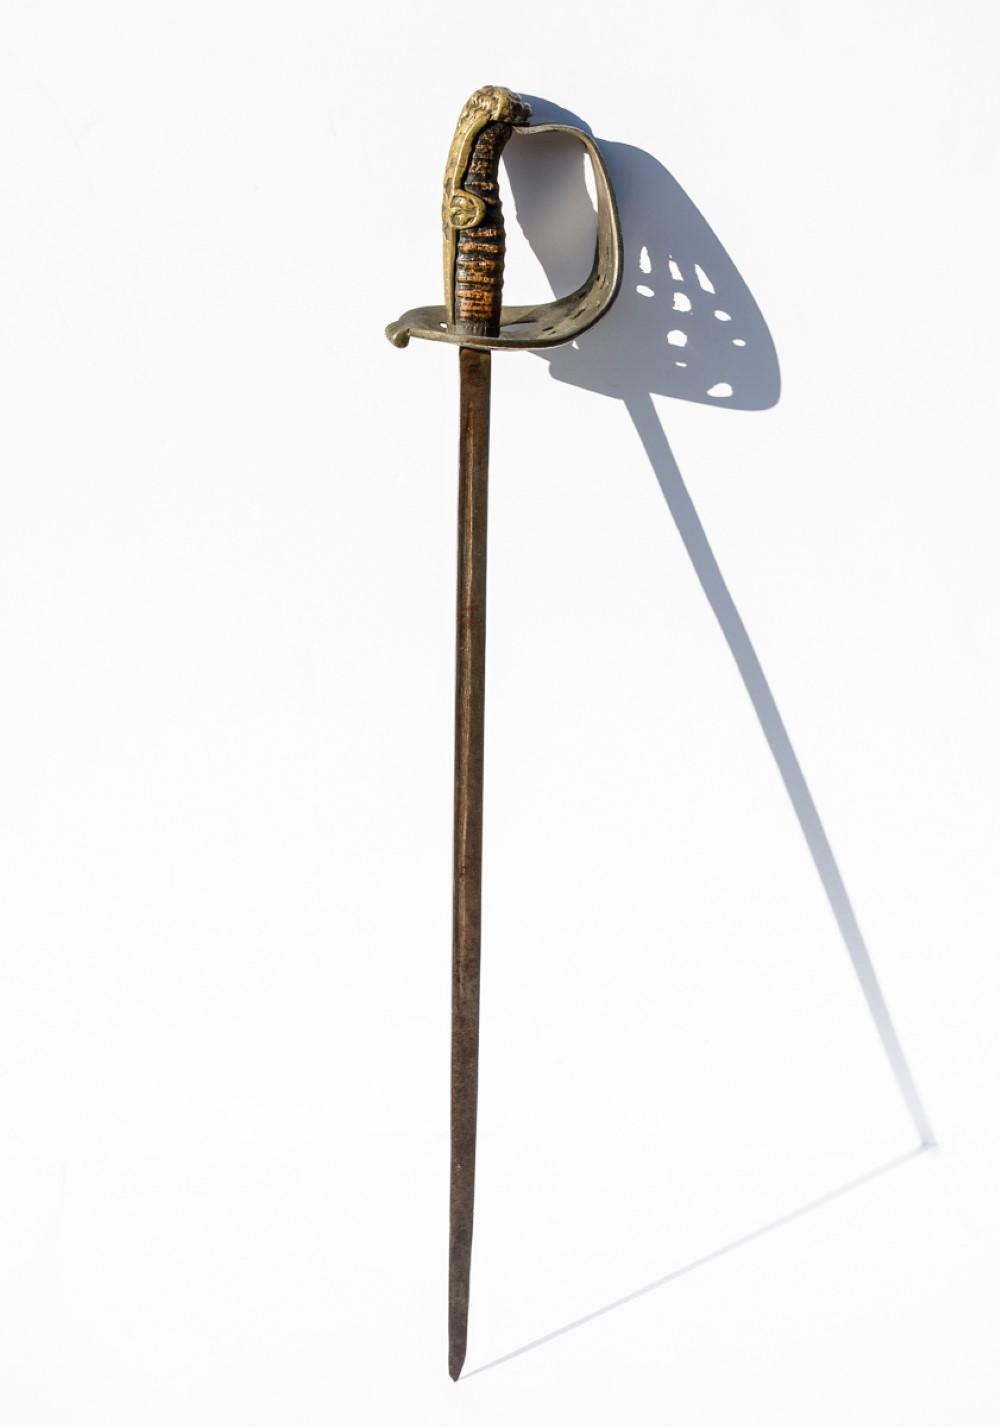 Civil War era child's sword